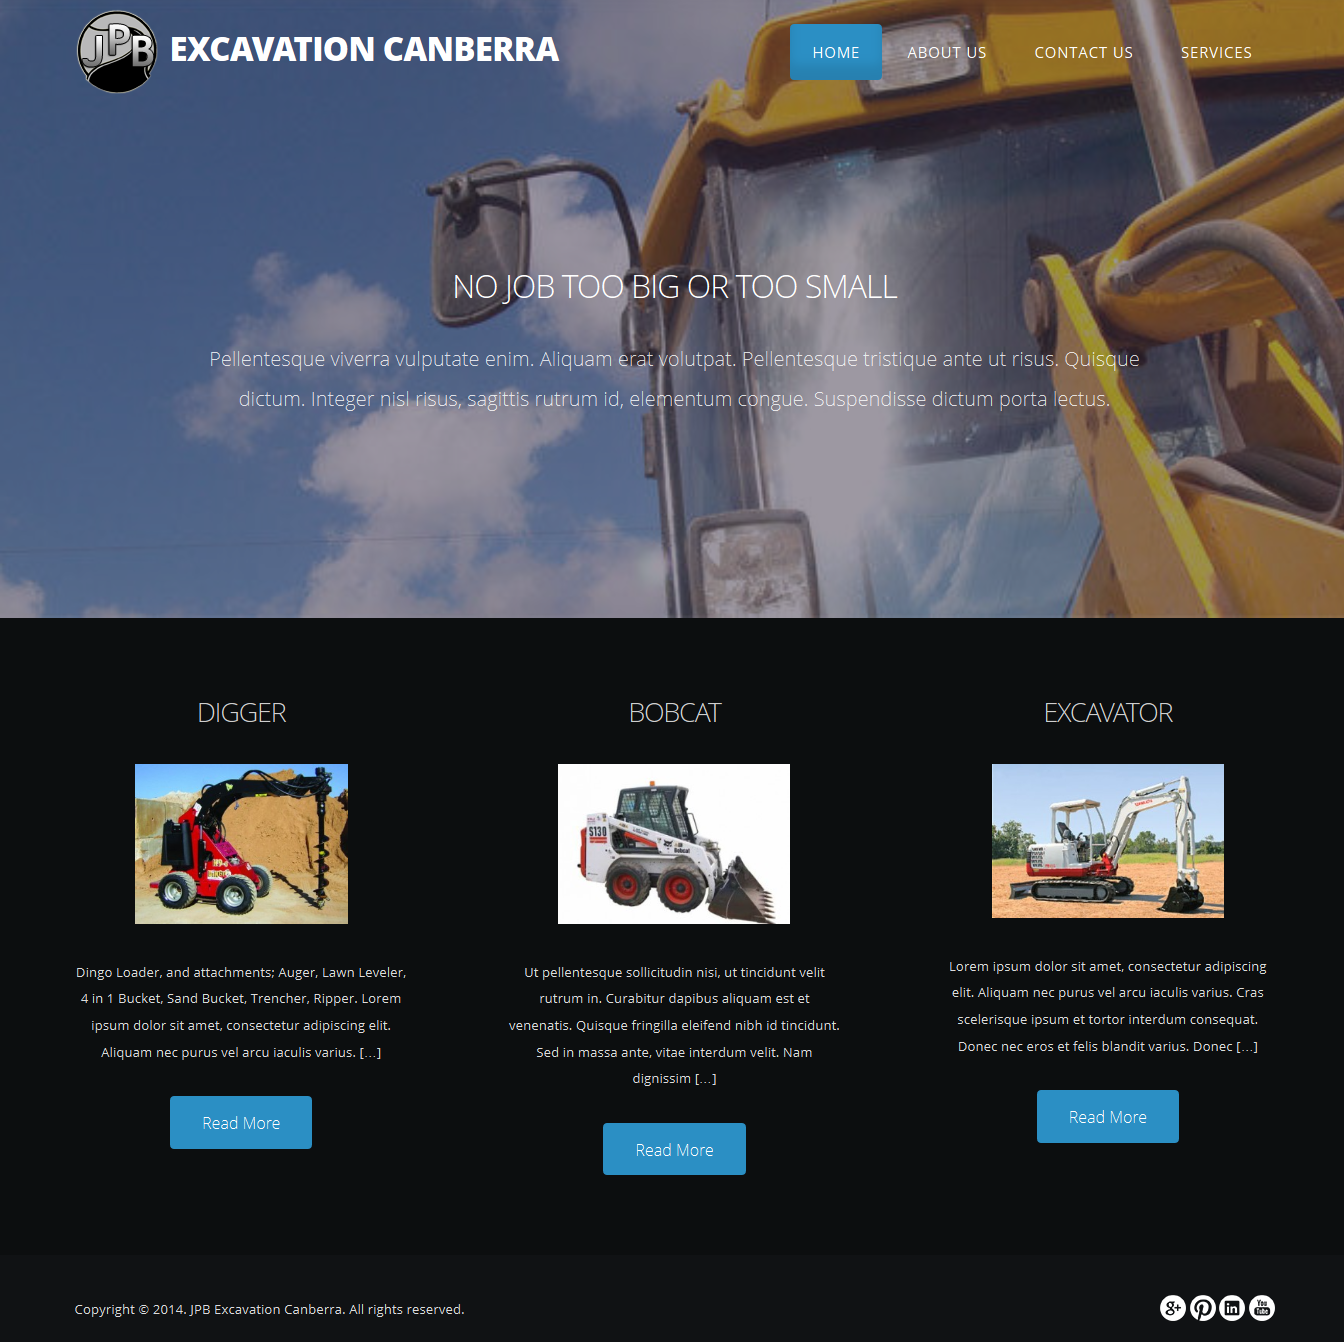 www.excavationcanberra.com